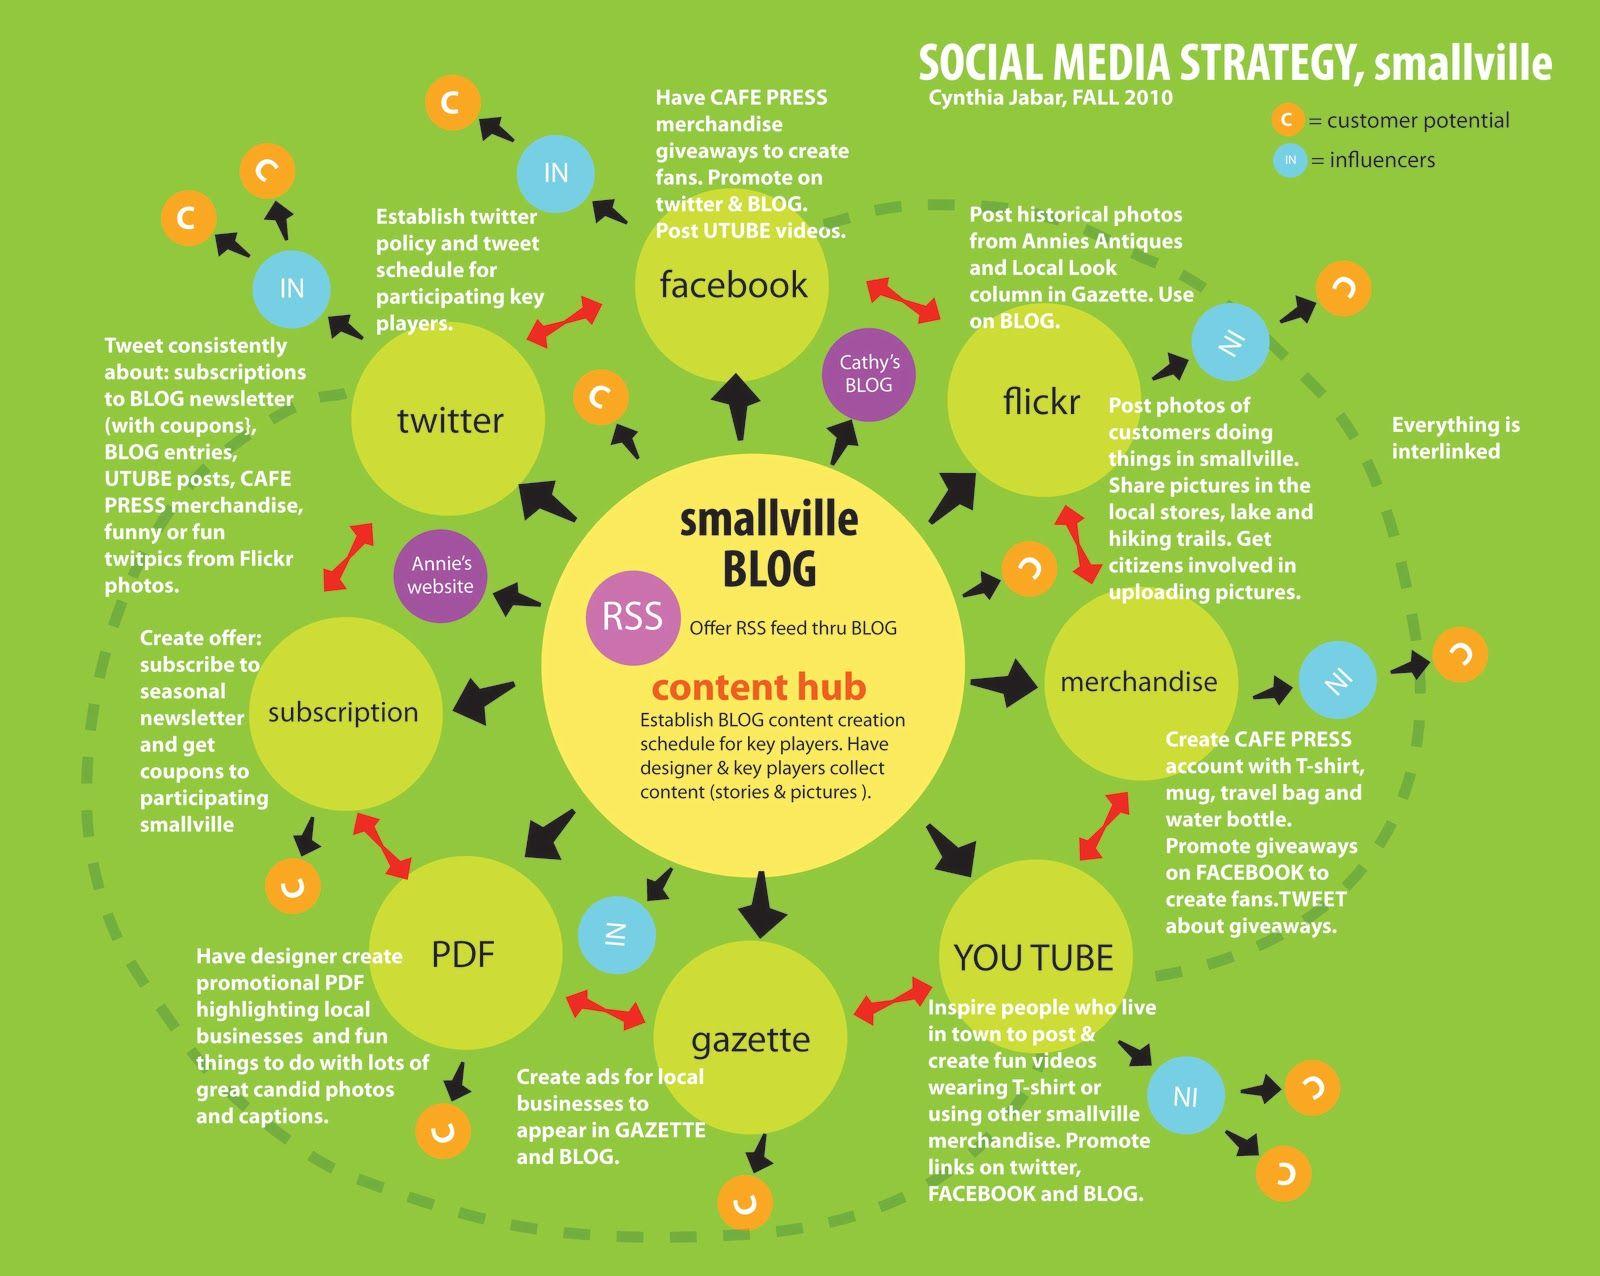 TransmediaKids.com: Cross Platform Storytelling Notes: Social Media Strategy